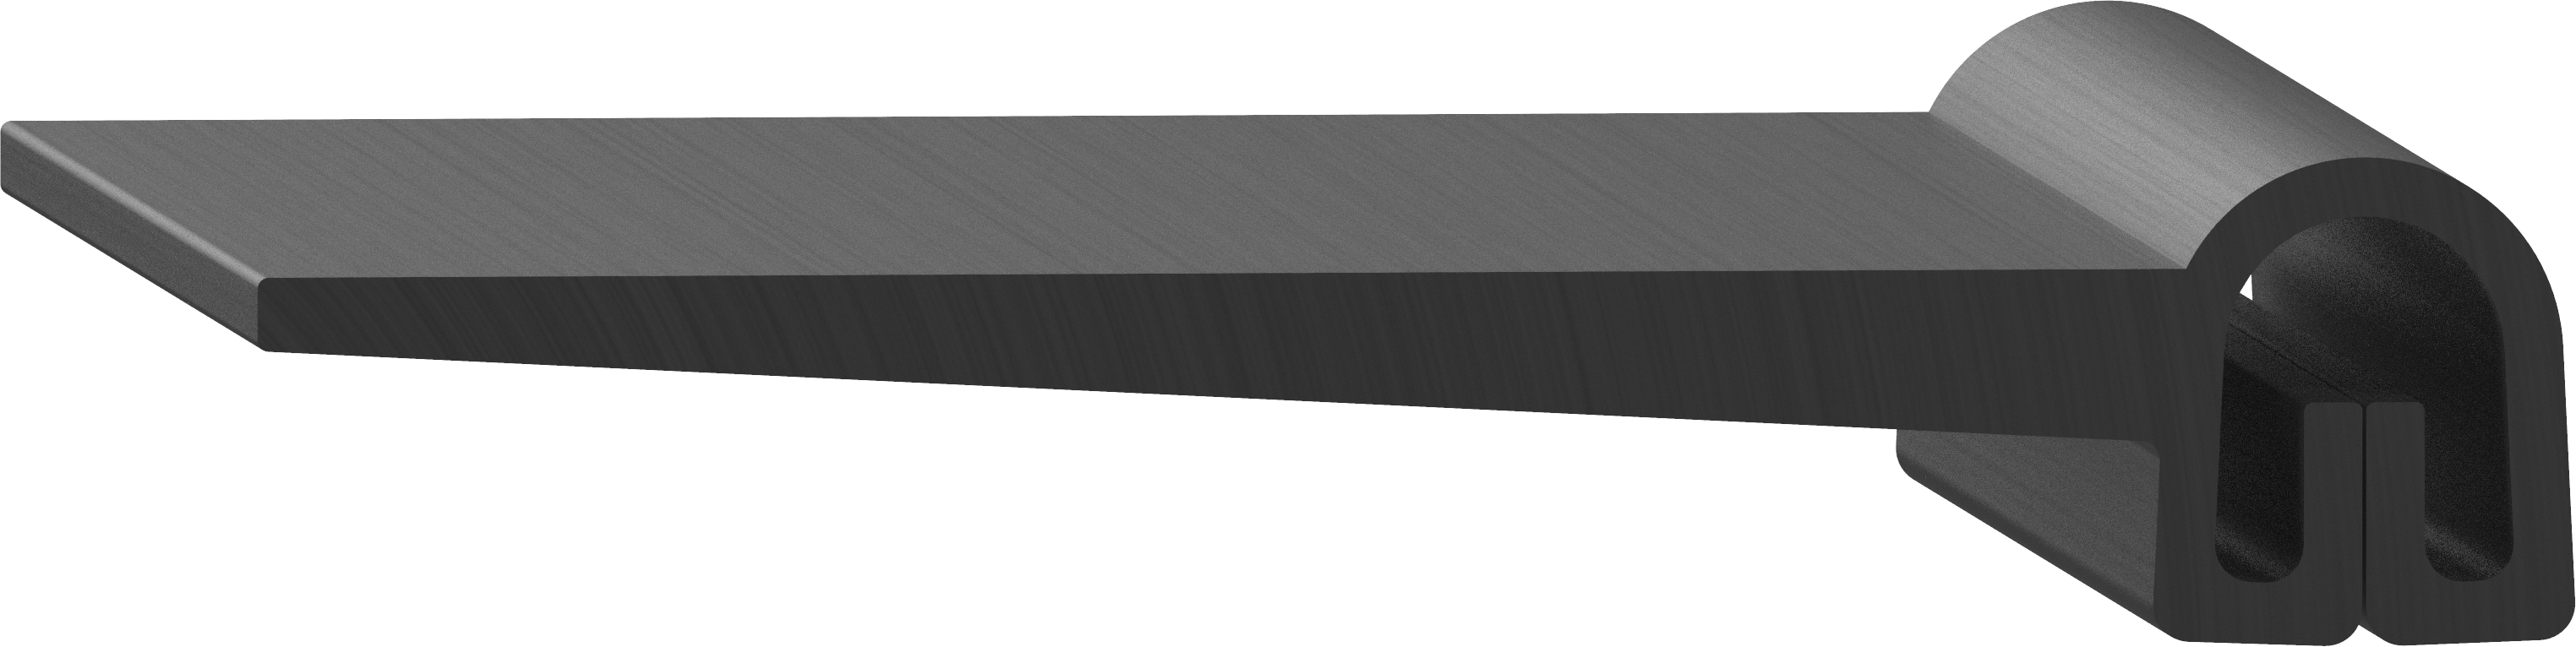 Uni-Grip part: ED-5335